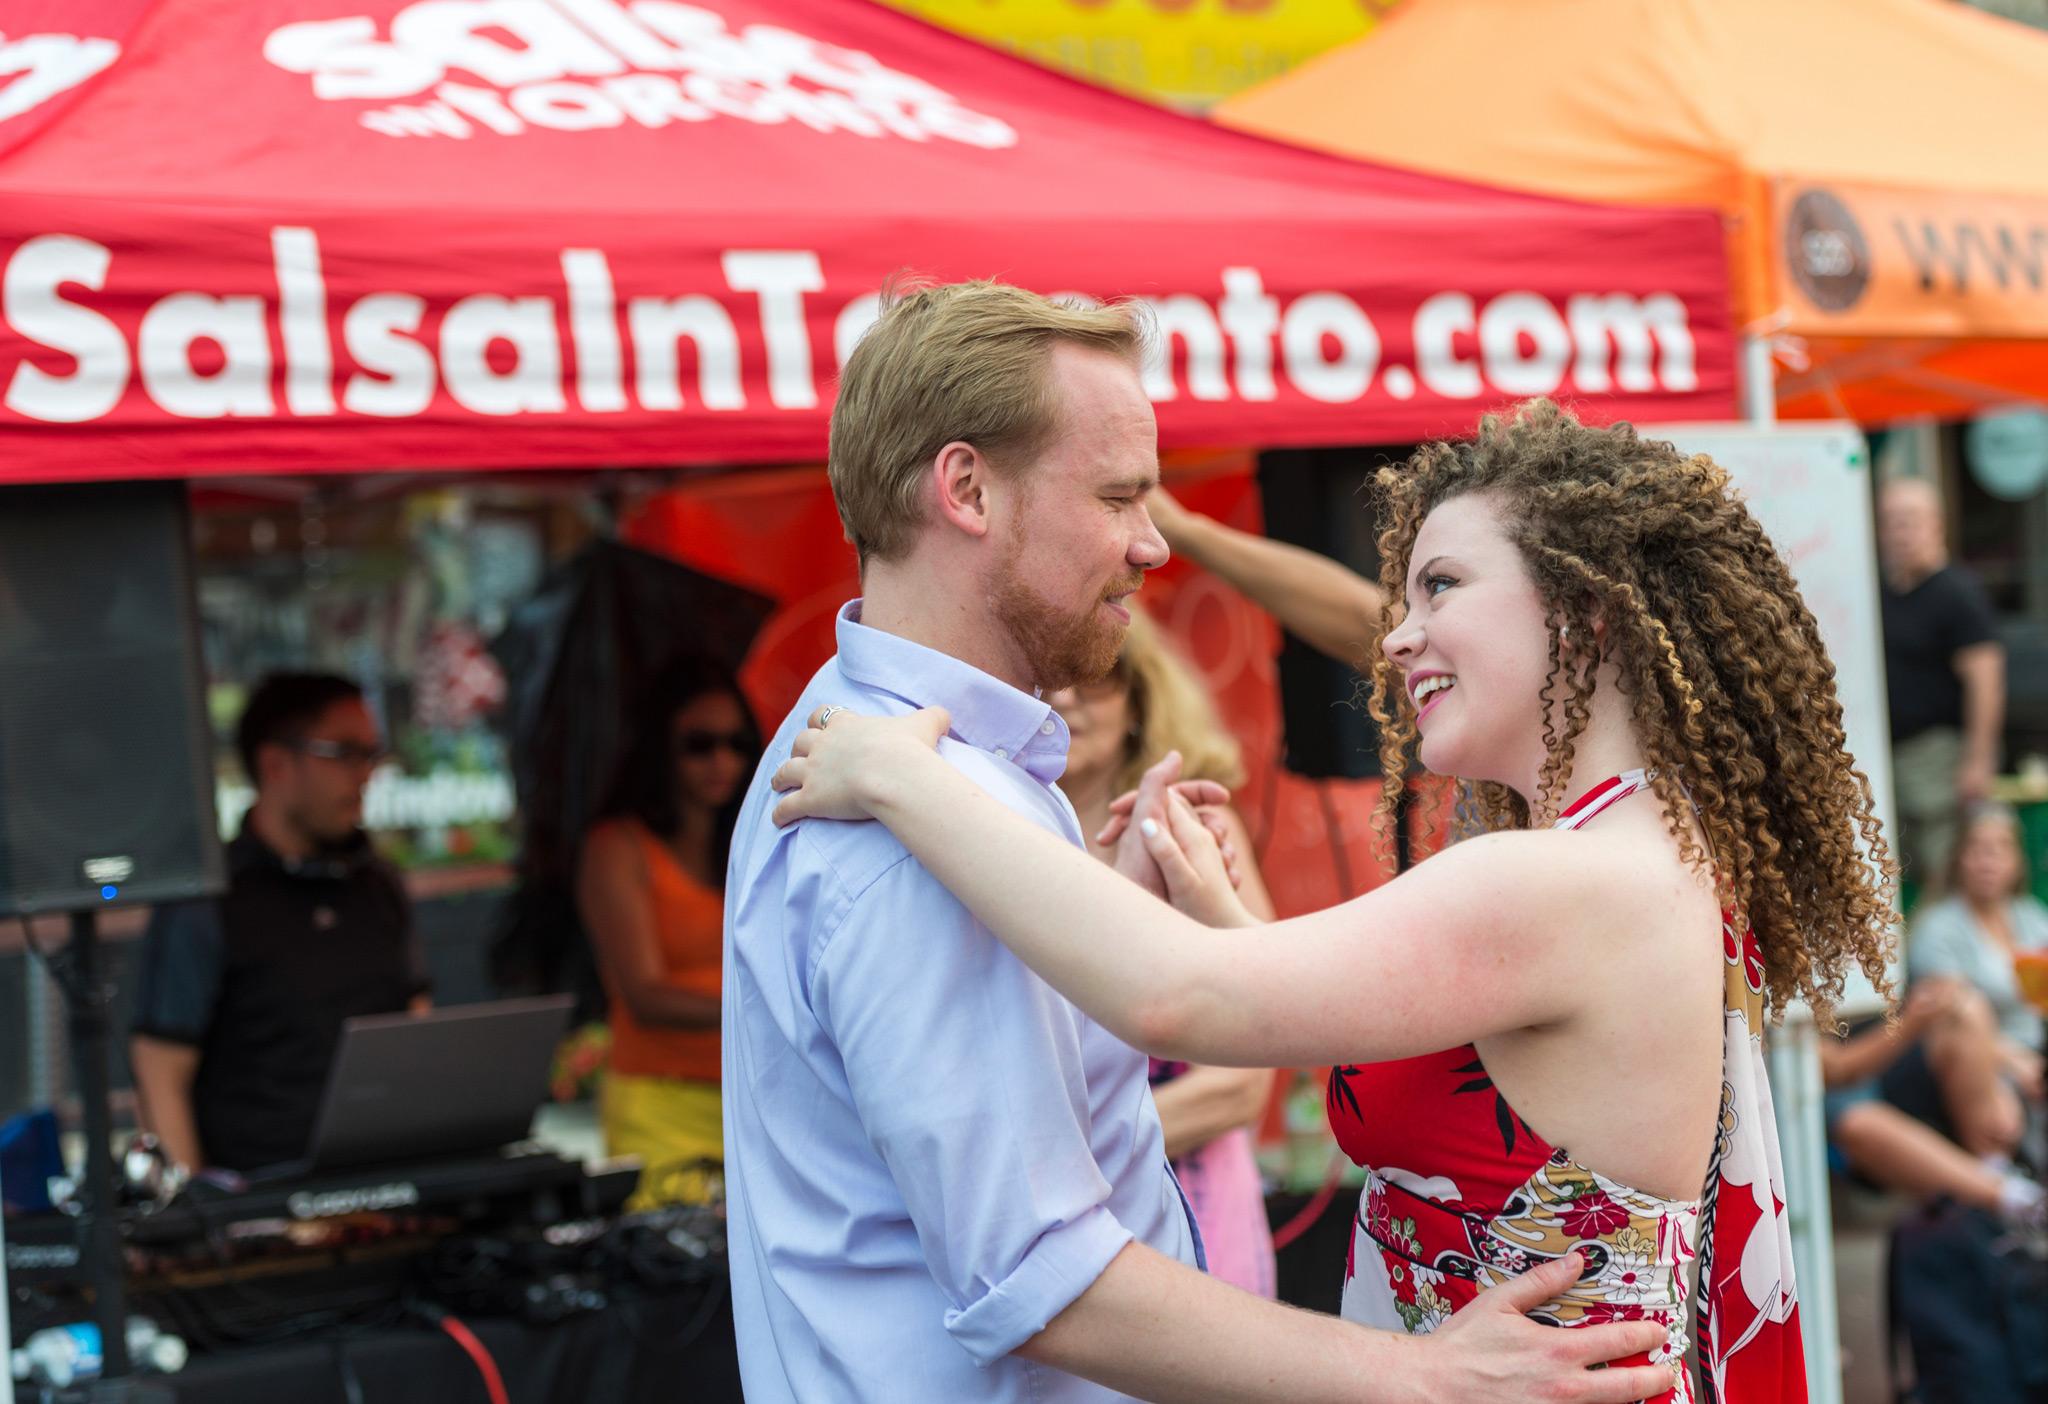 Sidewalk Salsa Dancing